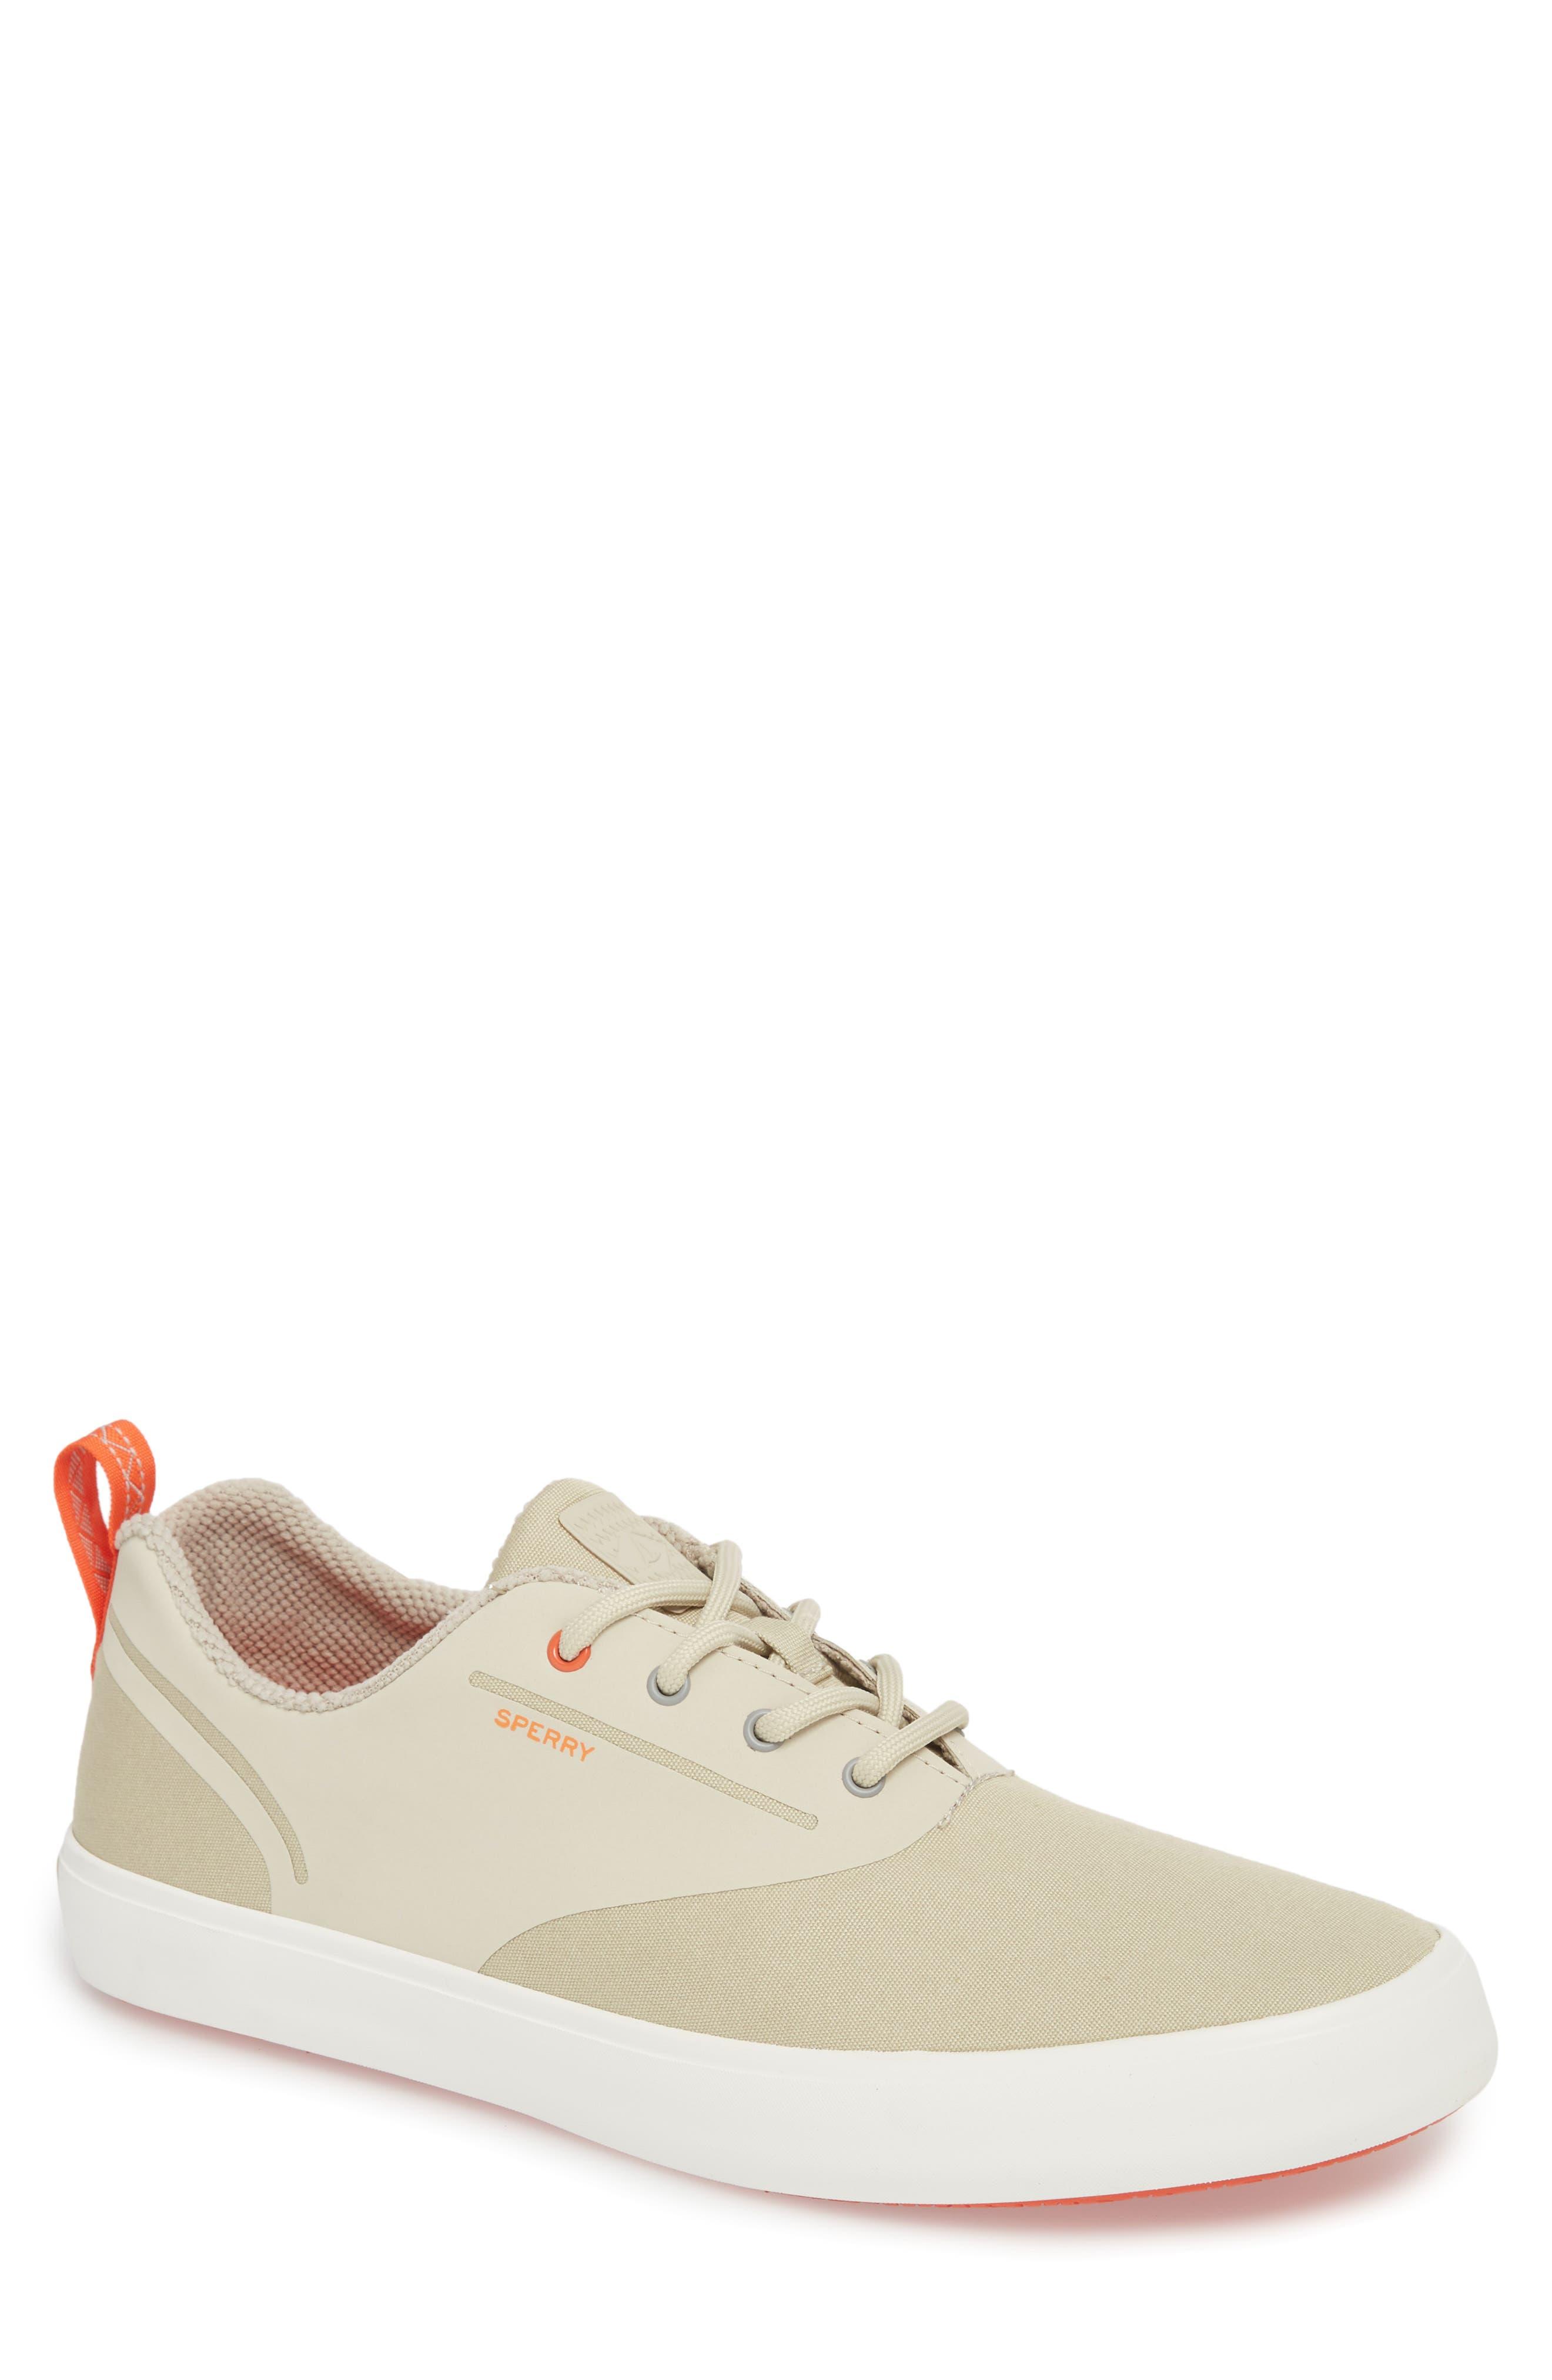 Flex Deck CVO Sneaker,                             Main thumbnail 1, color,                             BEIGE